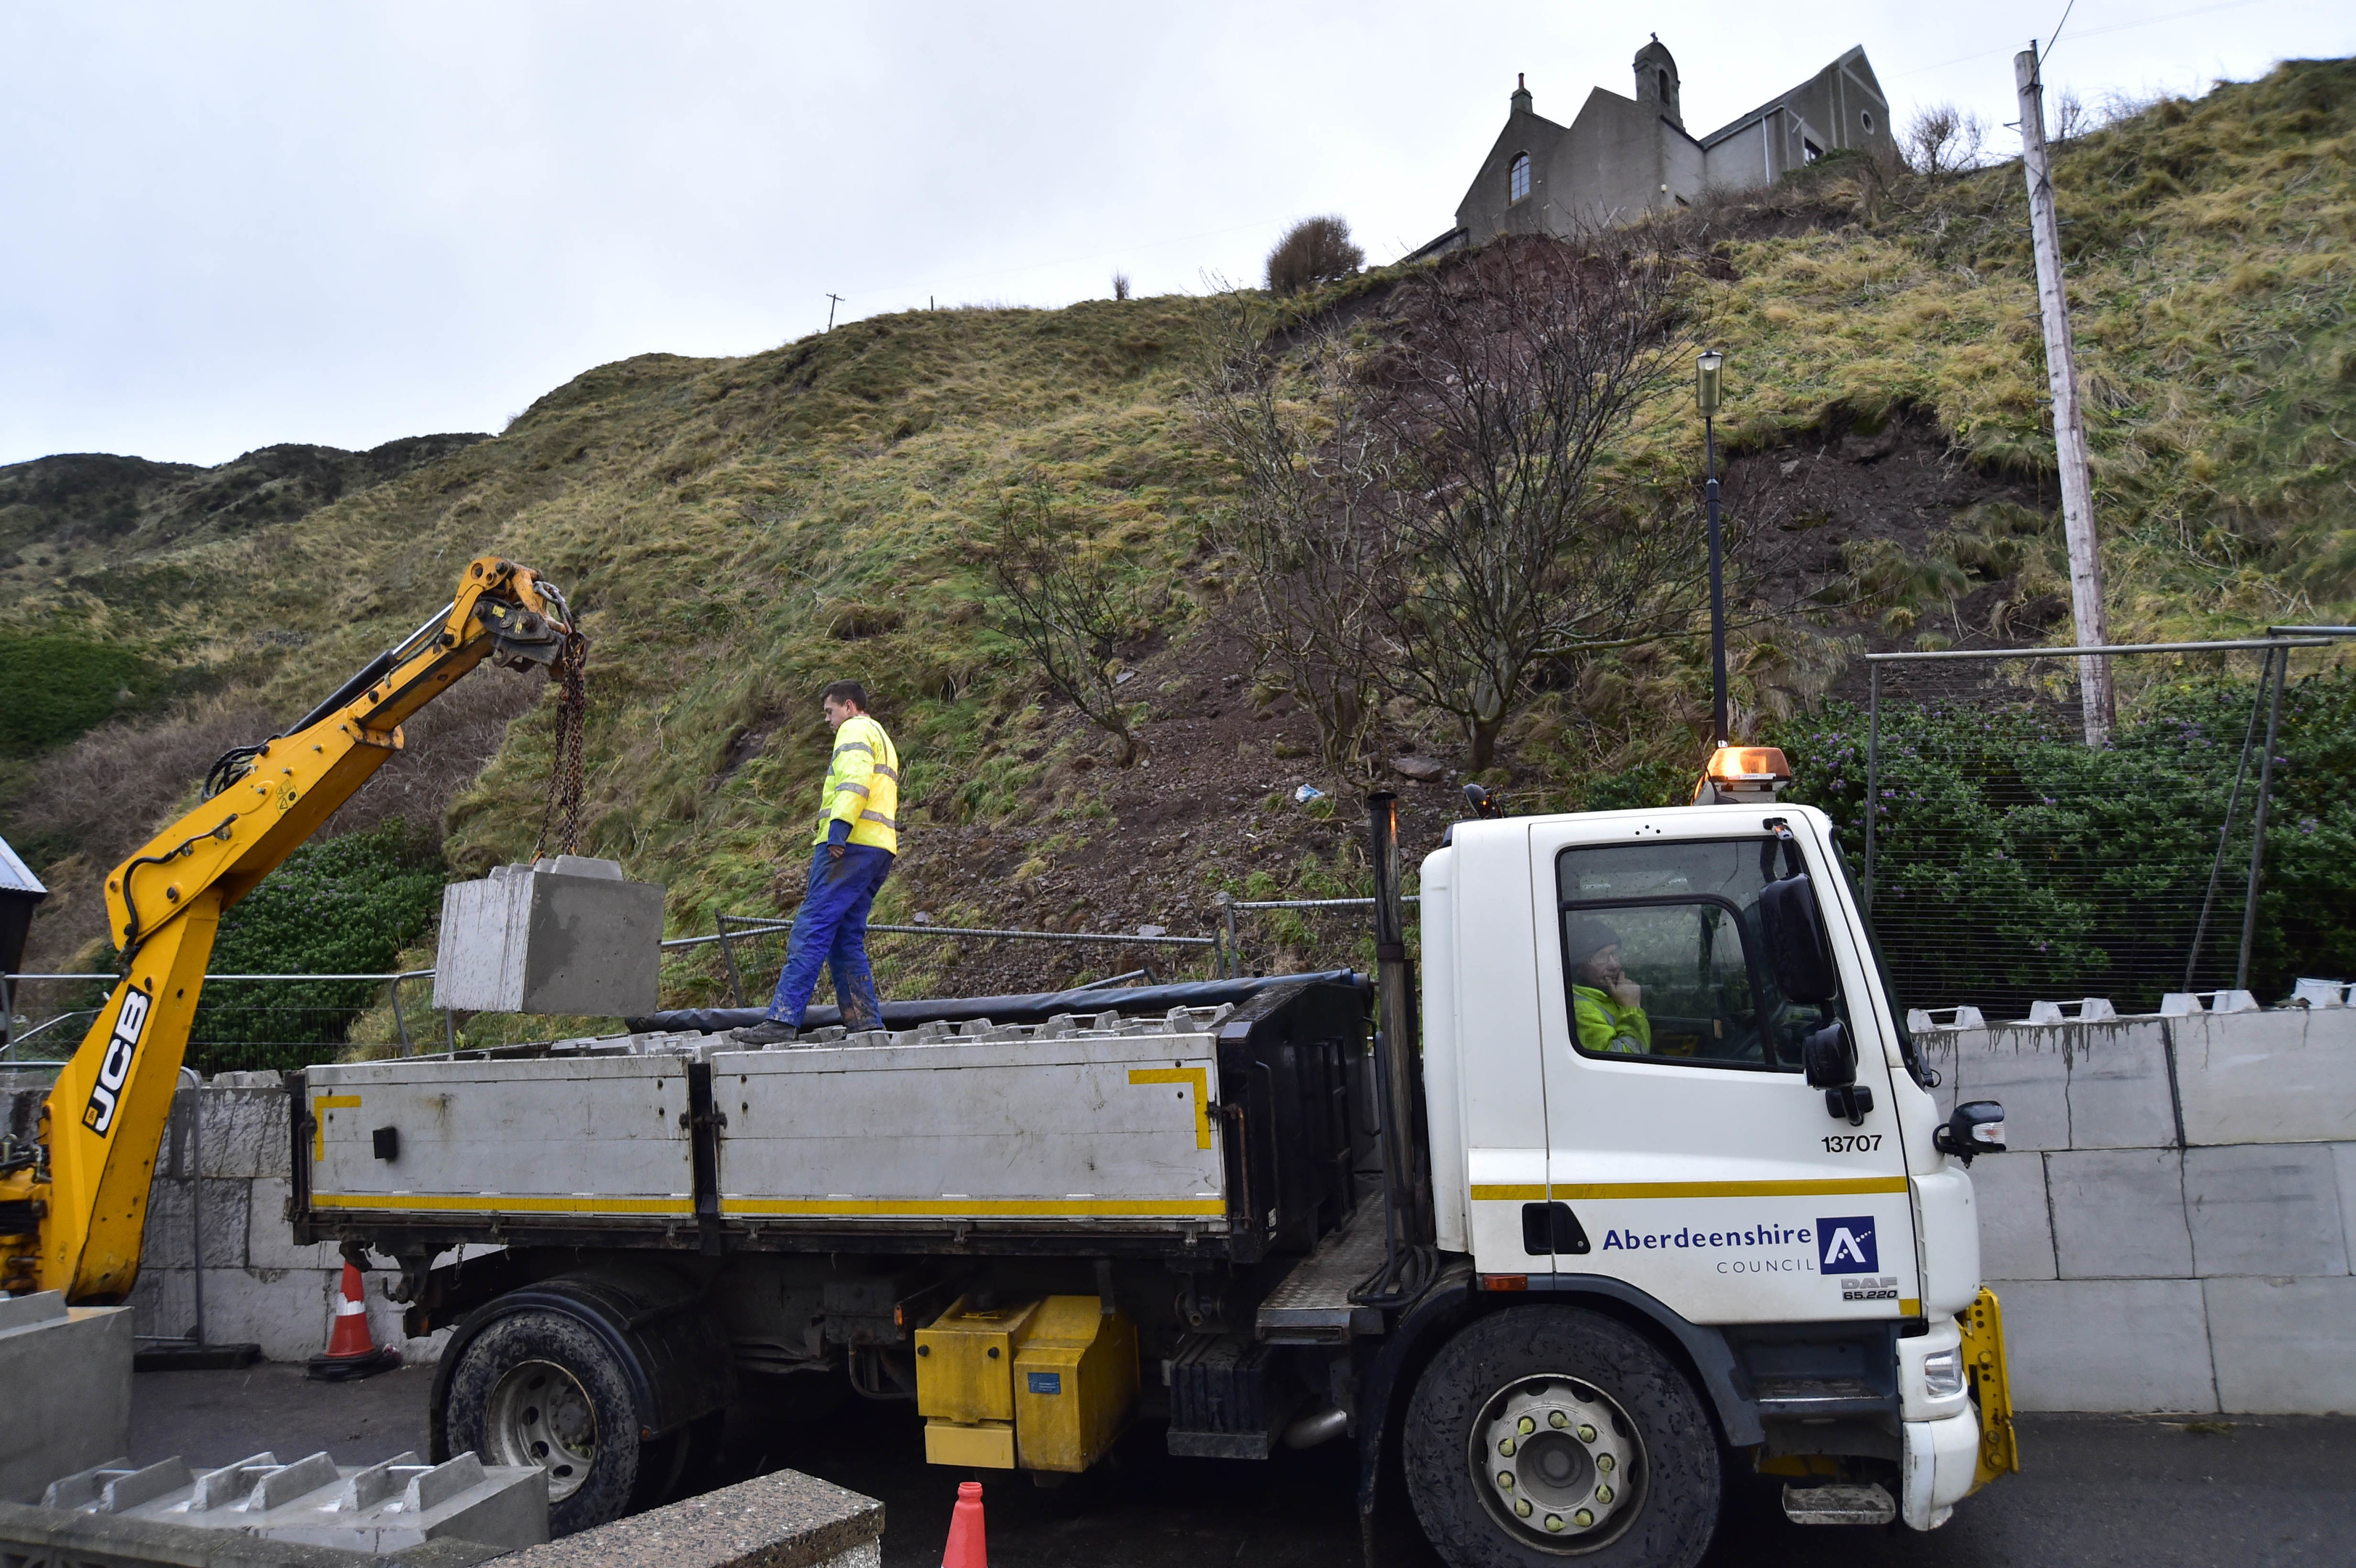 Efforts were underway to bolster the roadside yesterday.